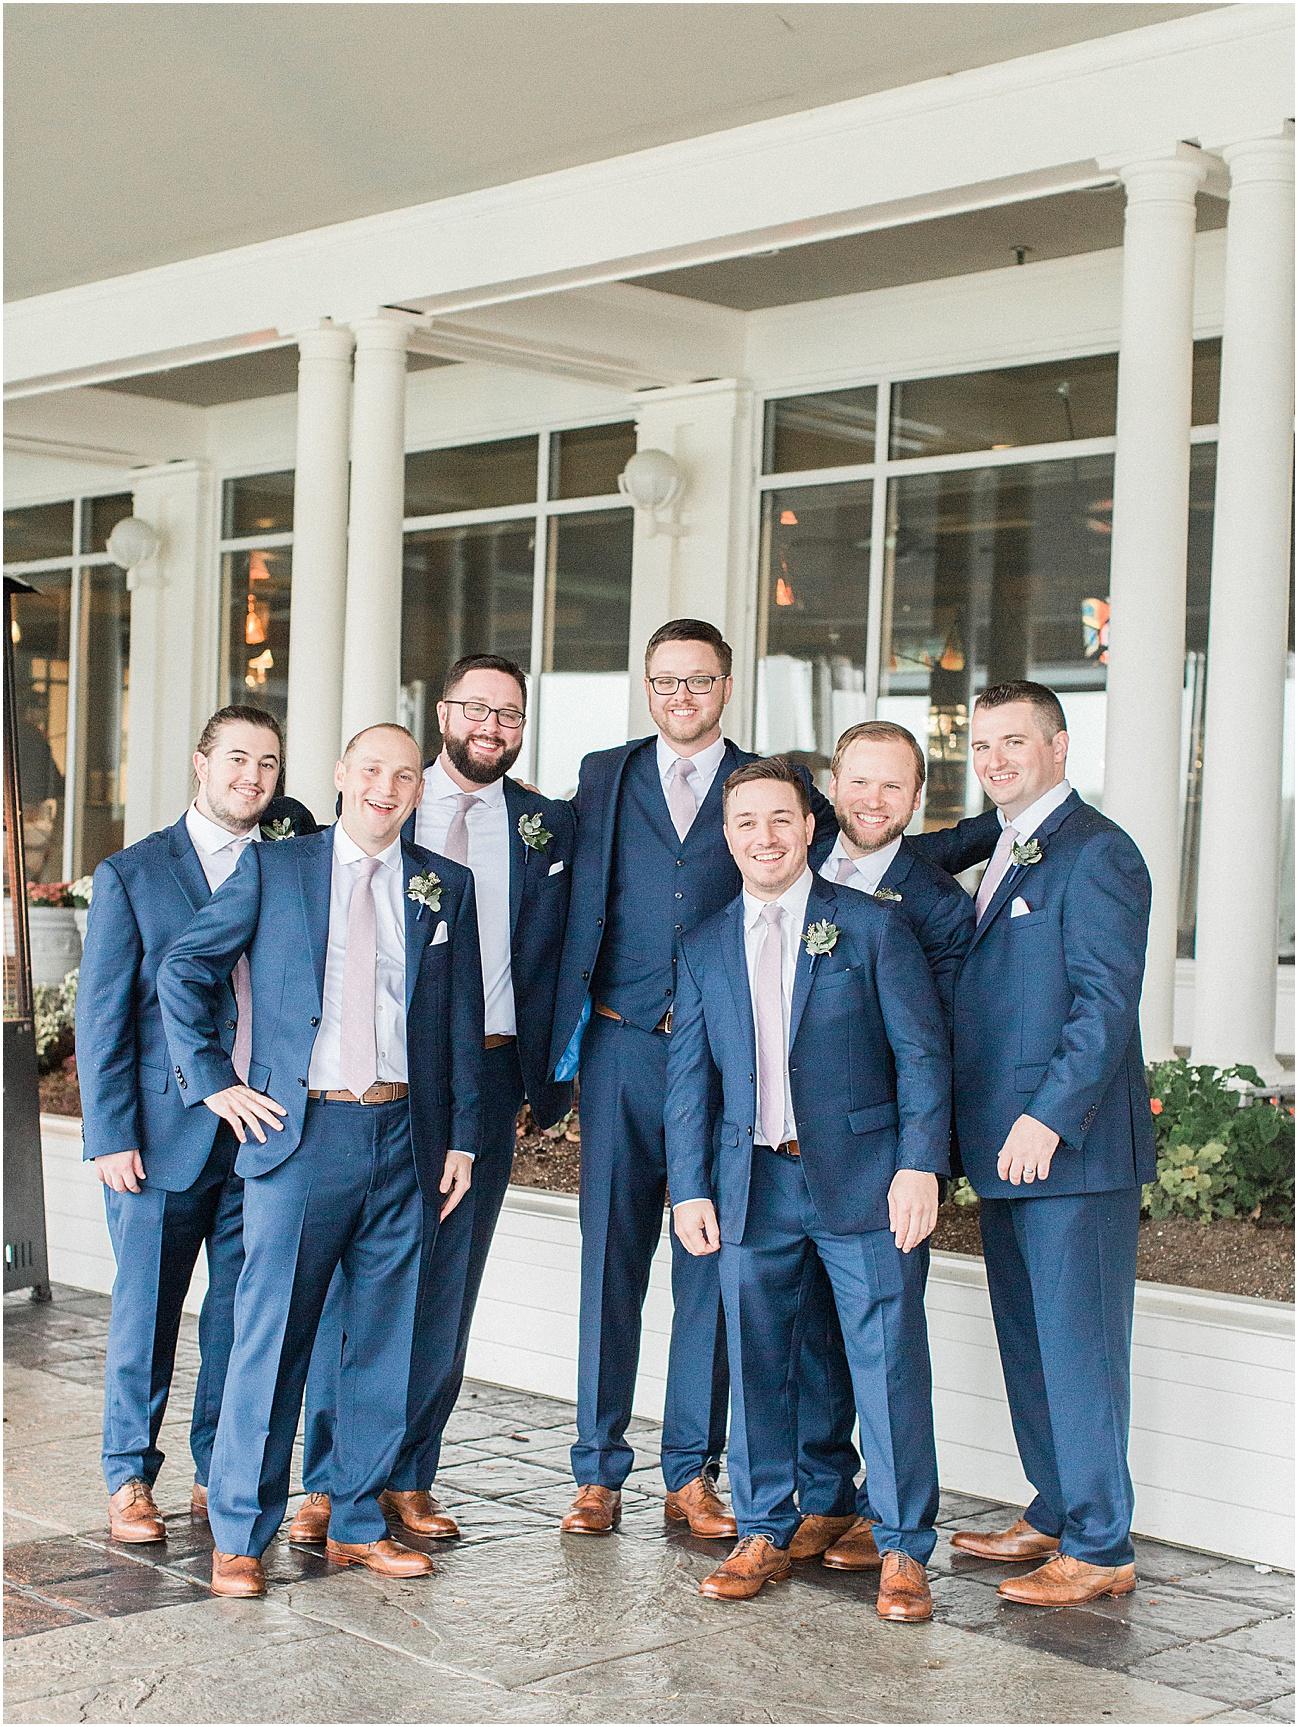 danielle_sean_willowbend_rain_rainy_day_cape_cod_boston_wedding_photographer_meredith_jane_photography_photo_1682.jpg